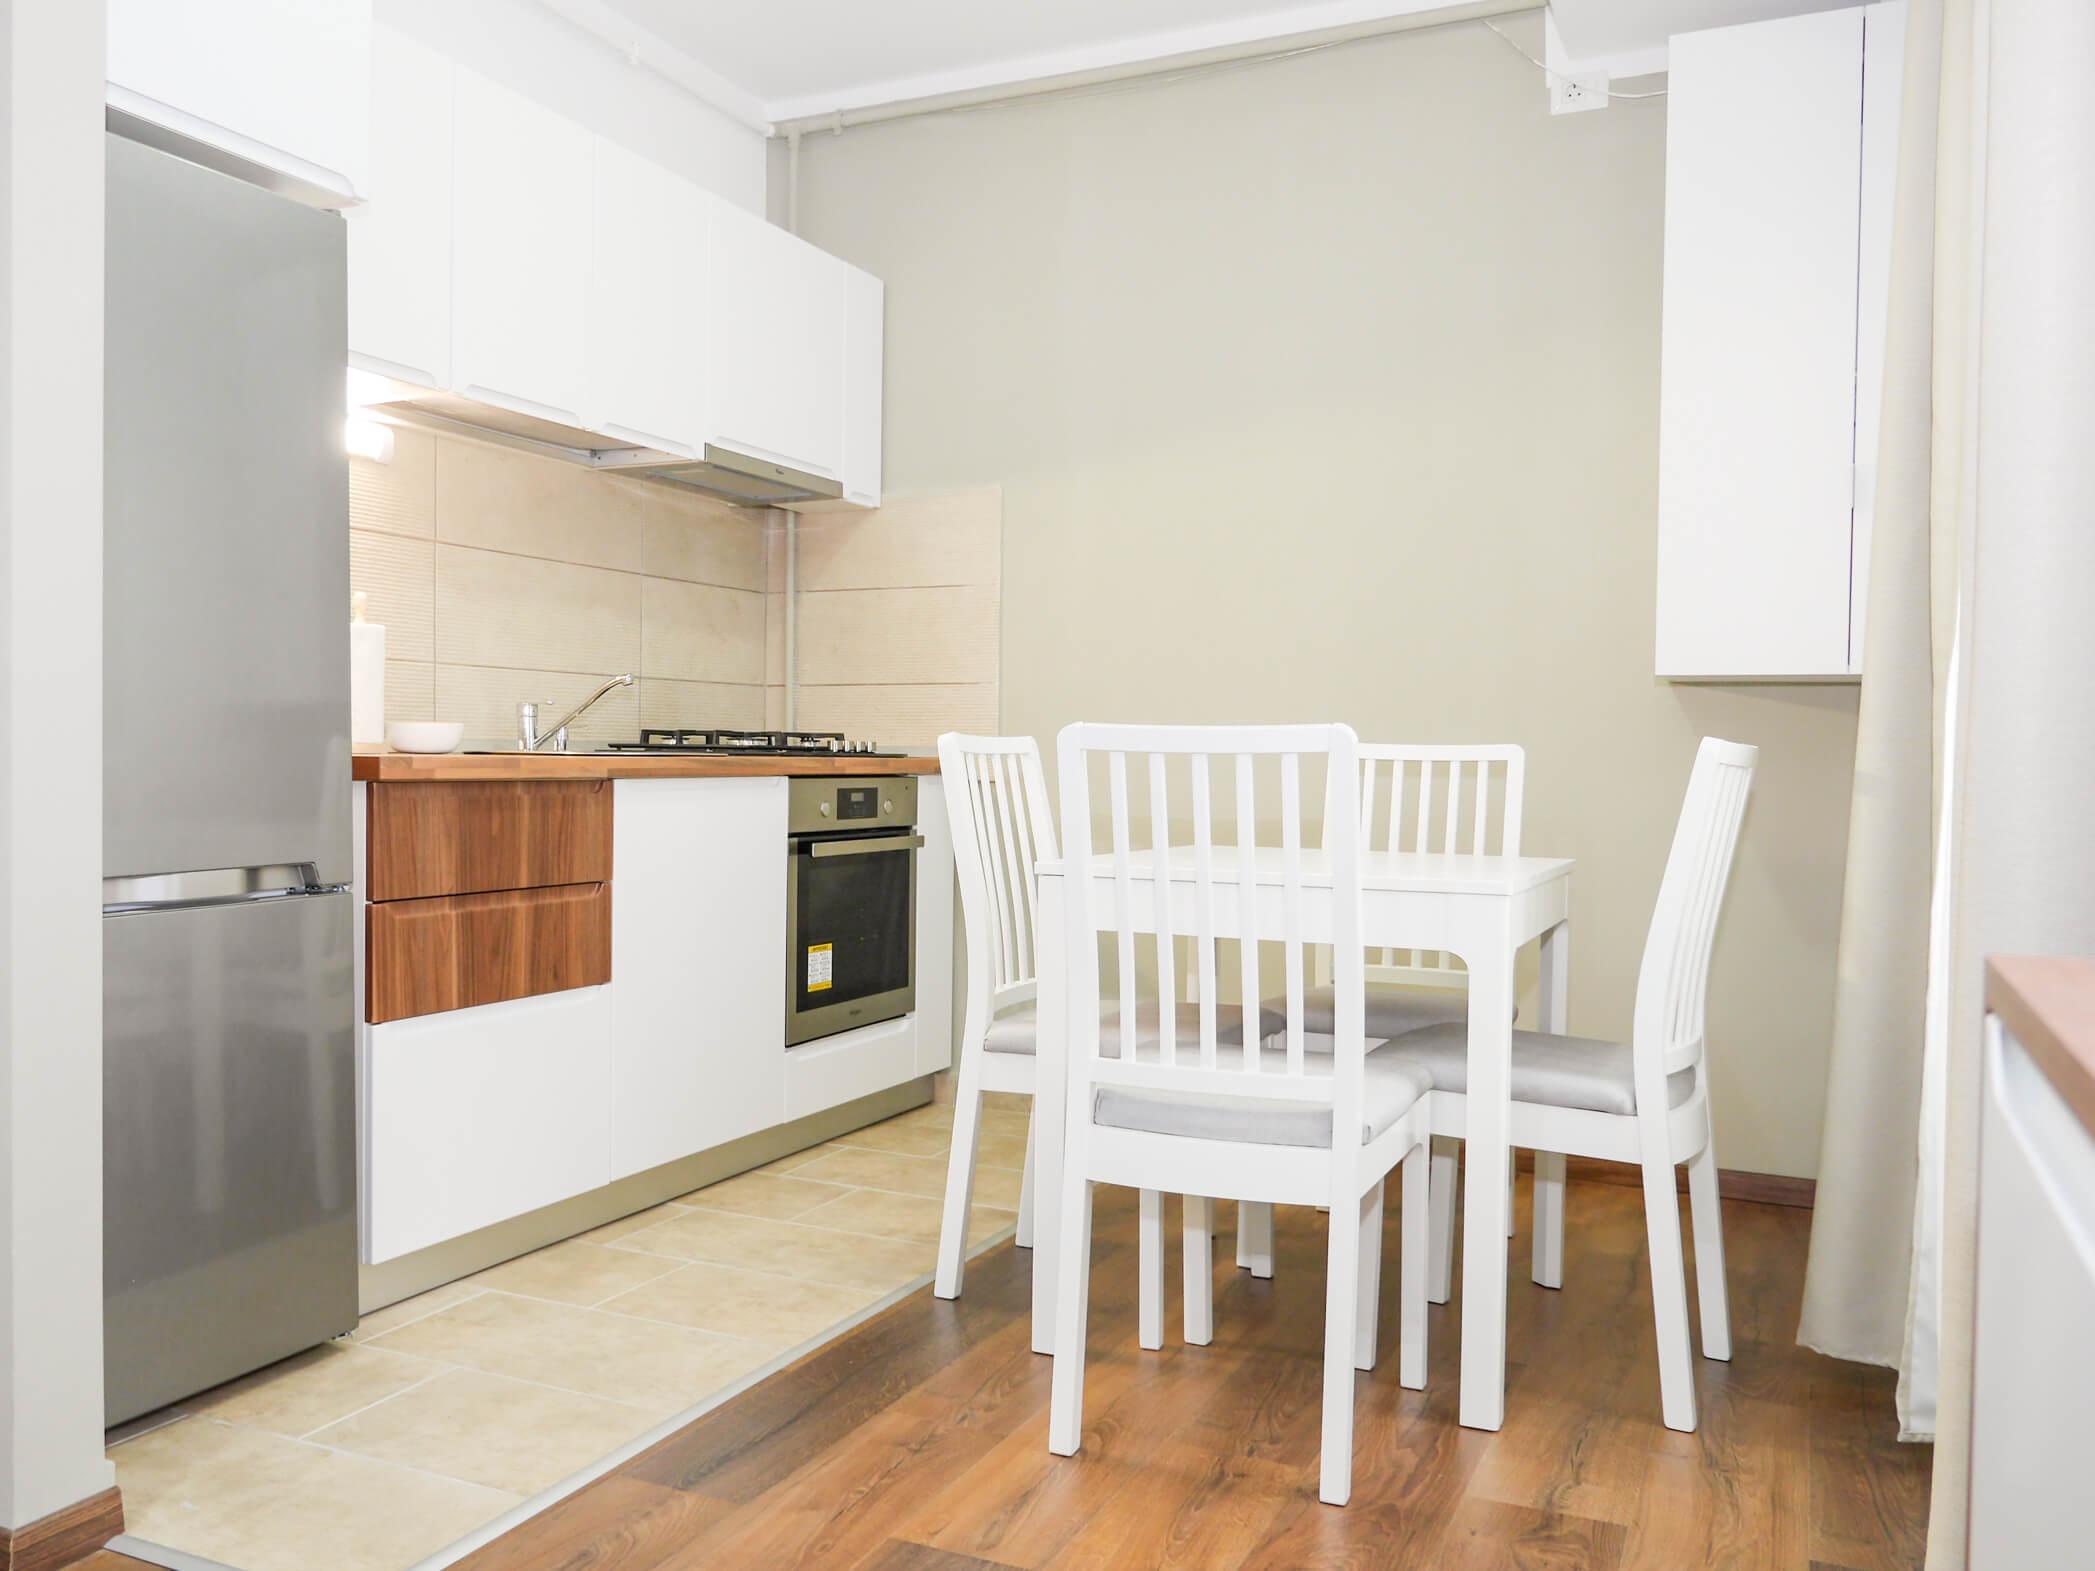 Clement Apartments - apartamente de inchiriat in regim hotelier - cazare neamt - cazare piatra neamt (2)